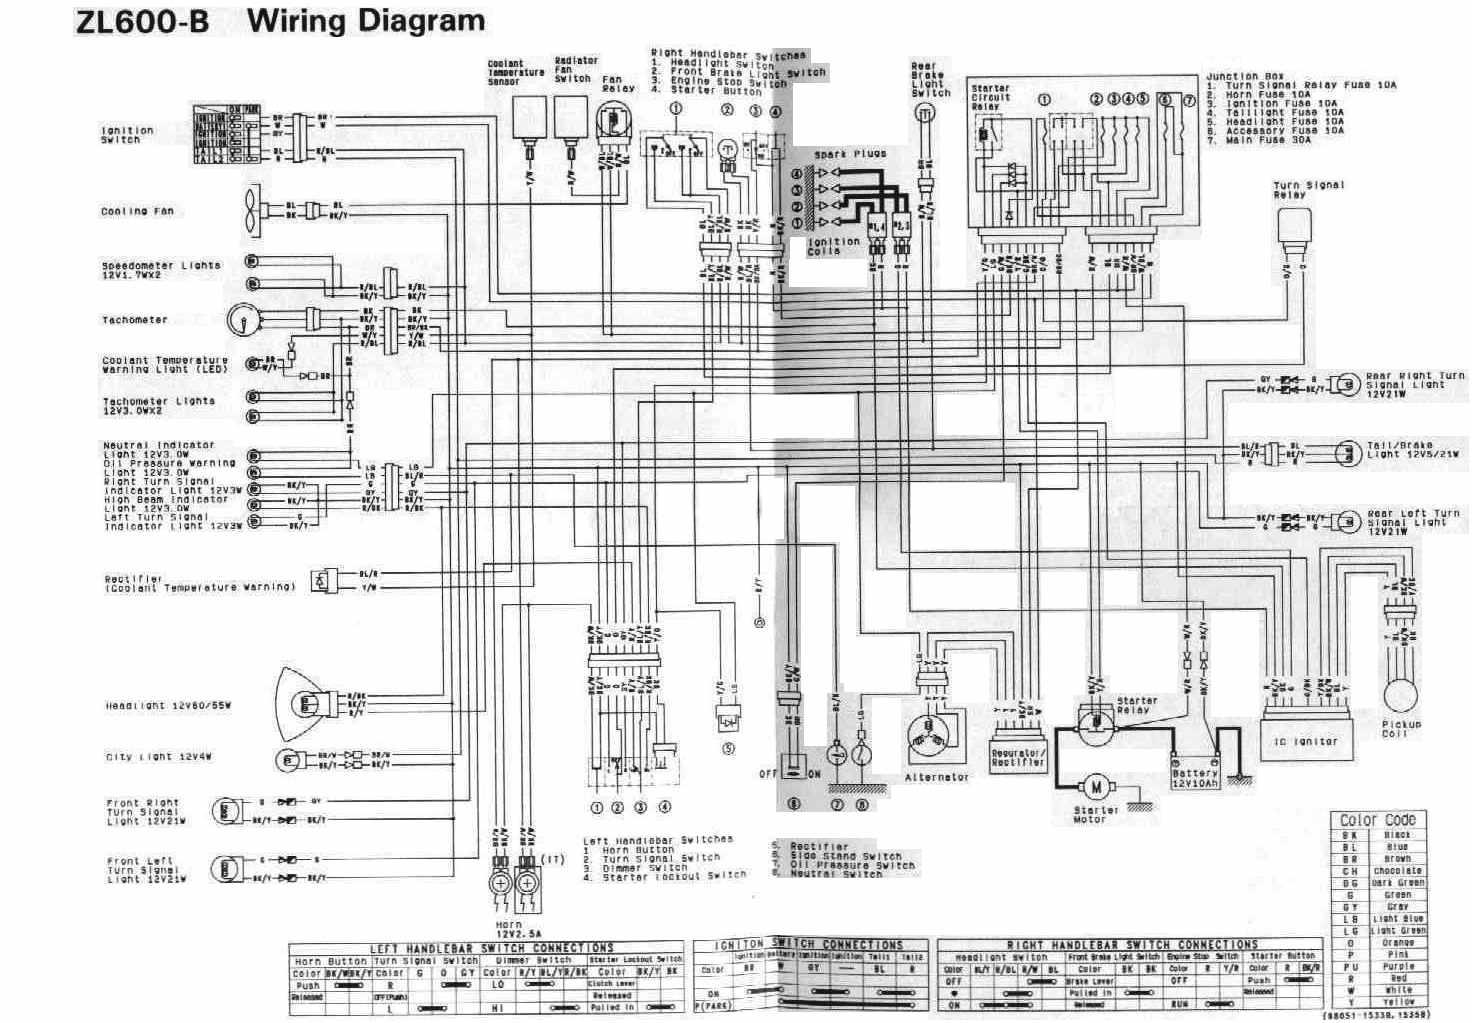 Kawasaki ZL600 1996 Motorcycle Wiring Diagram kawasaki wiring schematics images reverse search Basic Electrical Wiring Diagrams at readyjetset.co